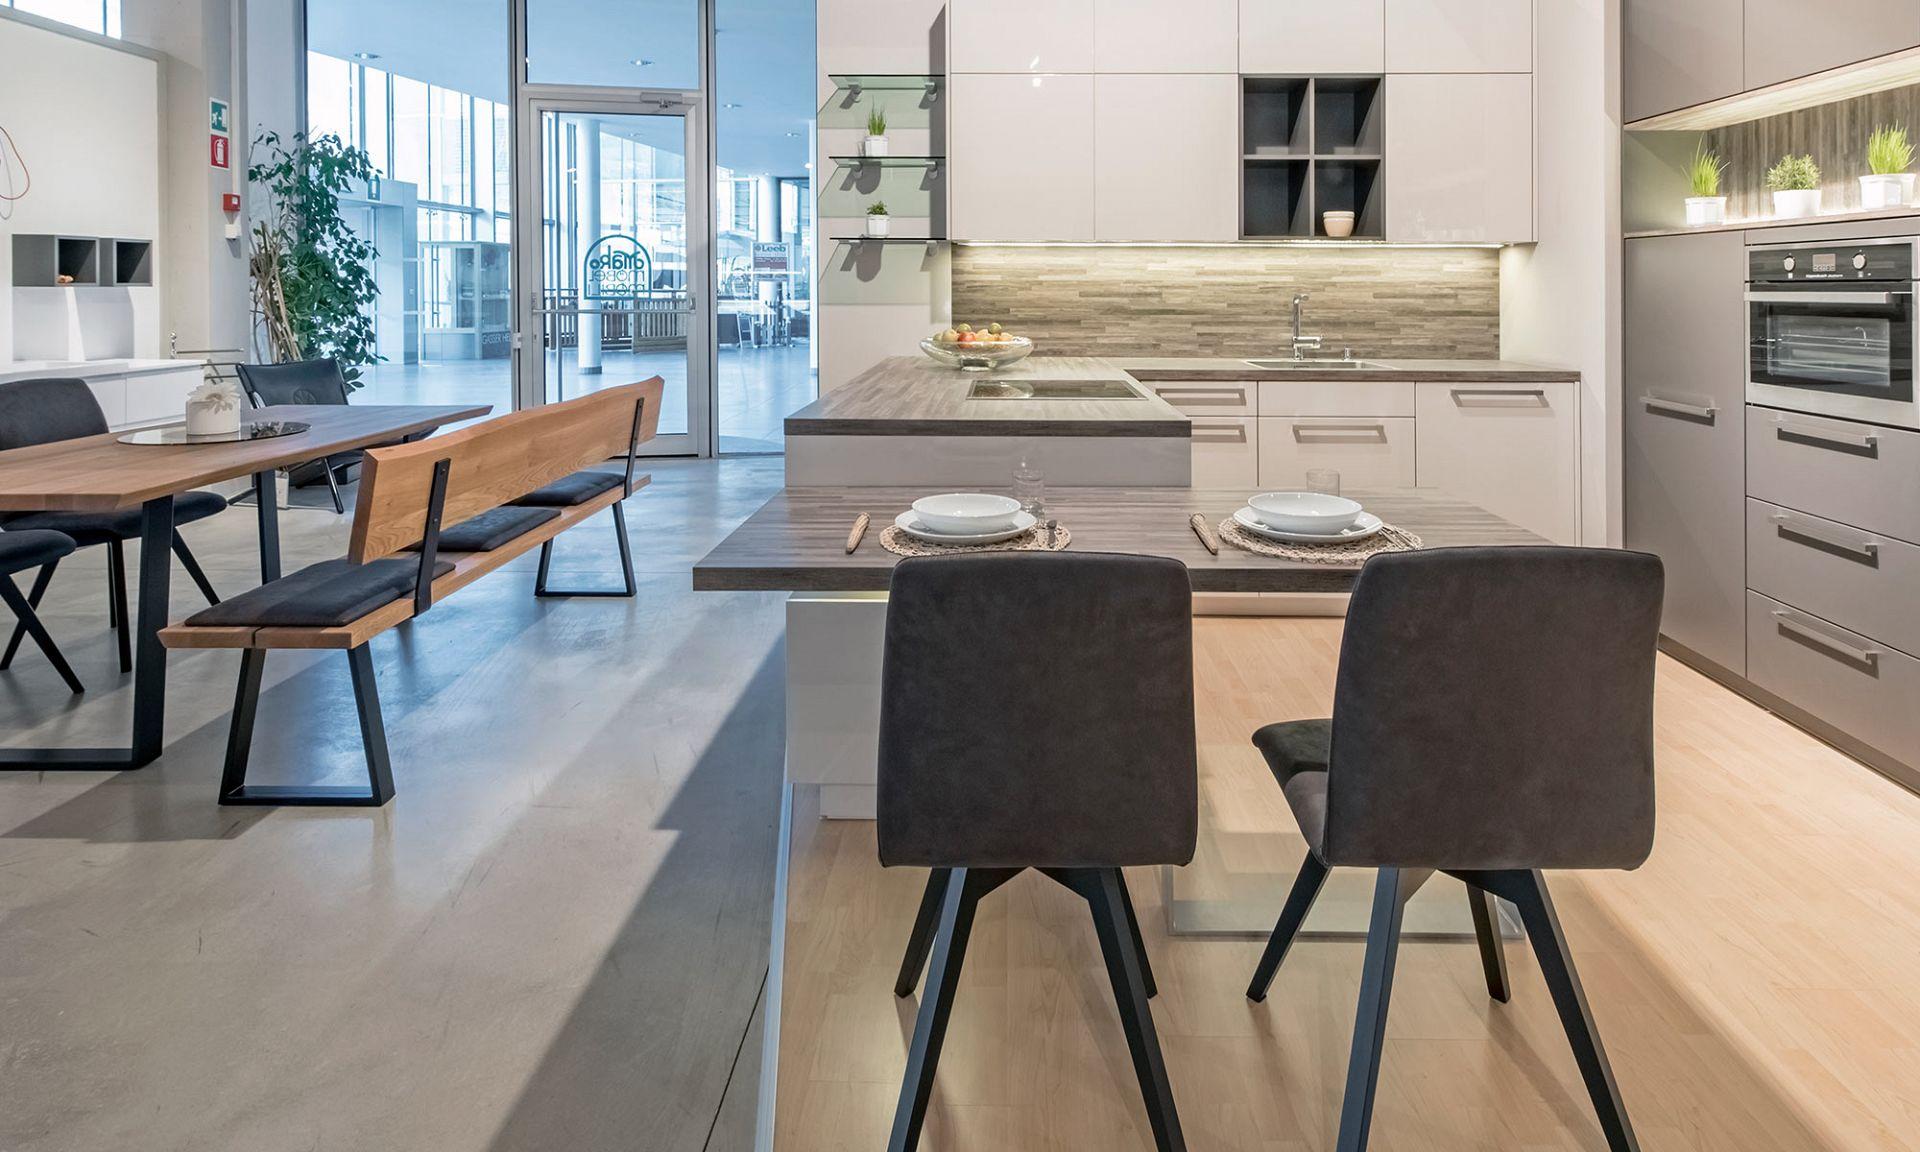 Das Küchenstudio in Südtirol mit großem Showroom